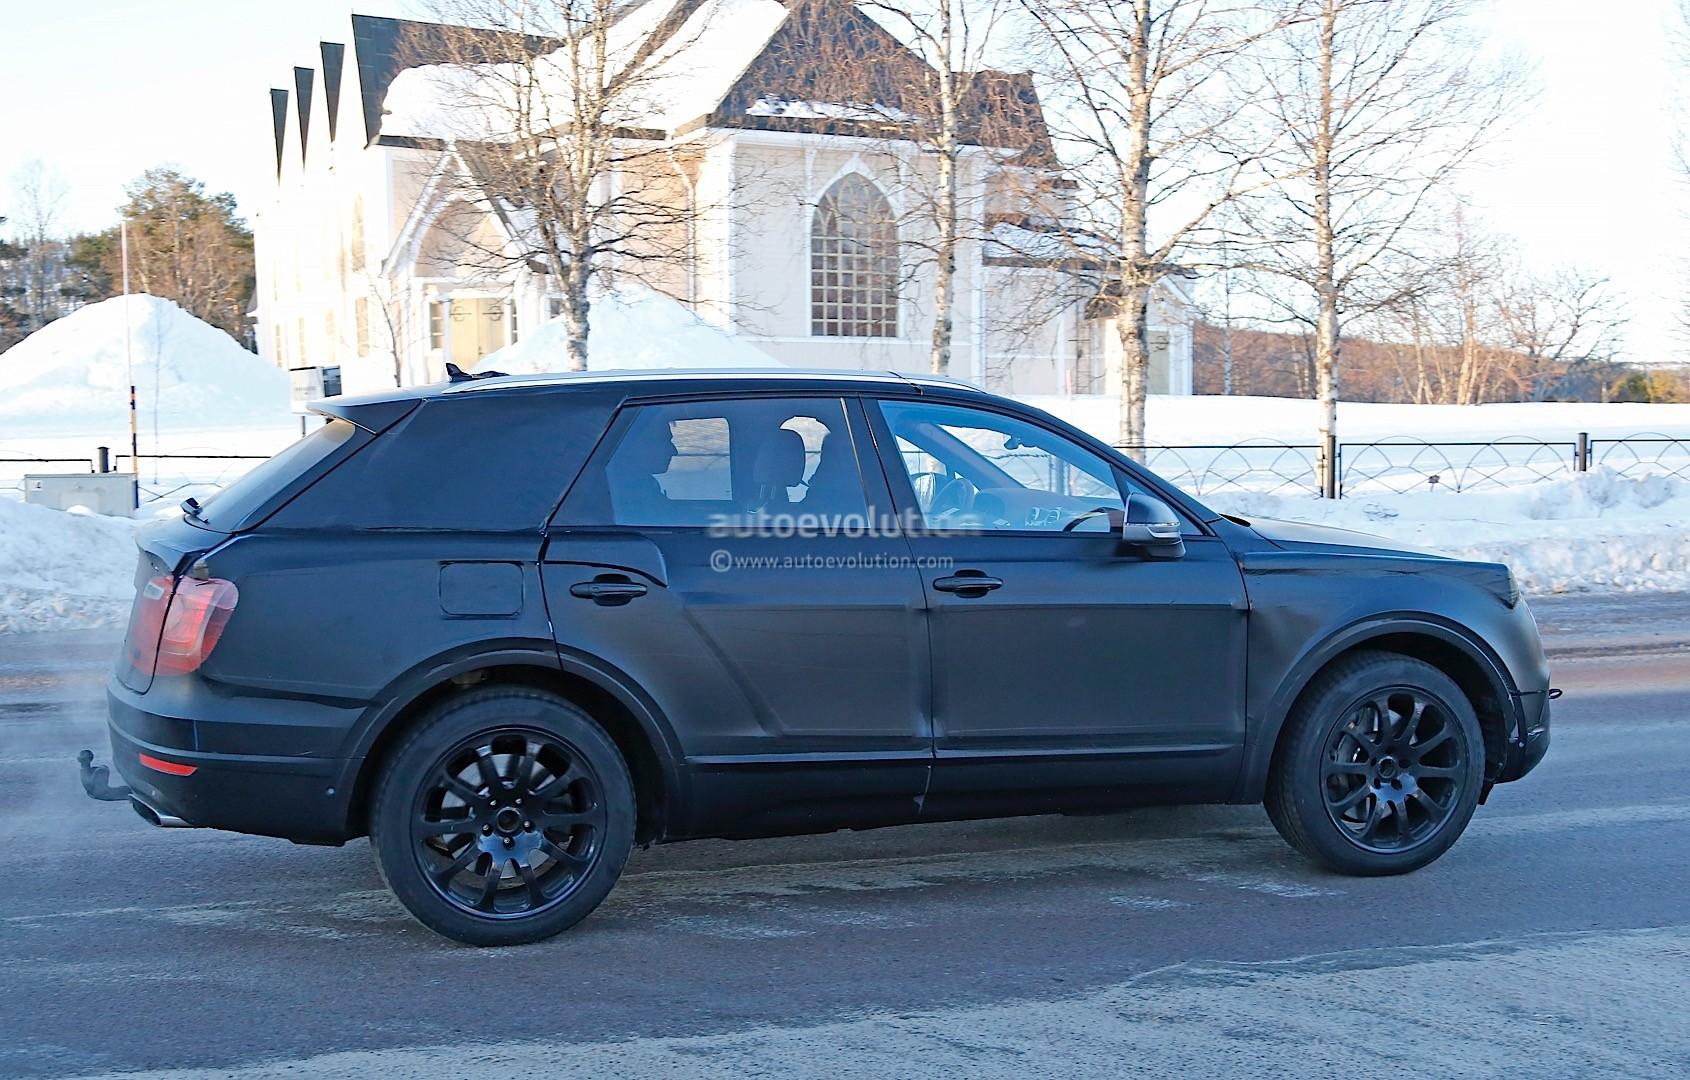 2015 - [Bentley] Bentayga - Page 5 Bentley-bentayga-spied-once-again-looks-like-an-edgier-vw-touareg-photo-gallery_6